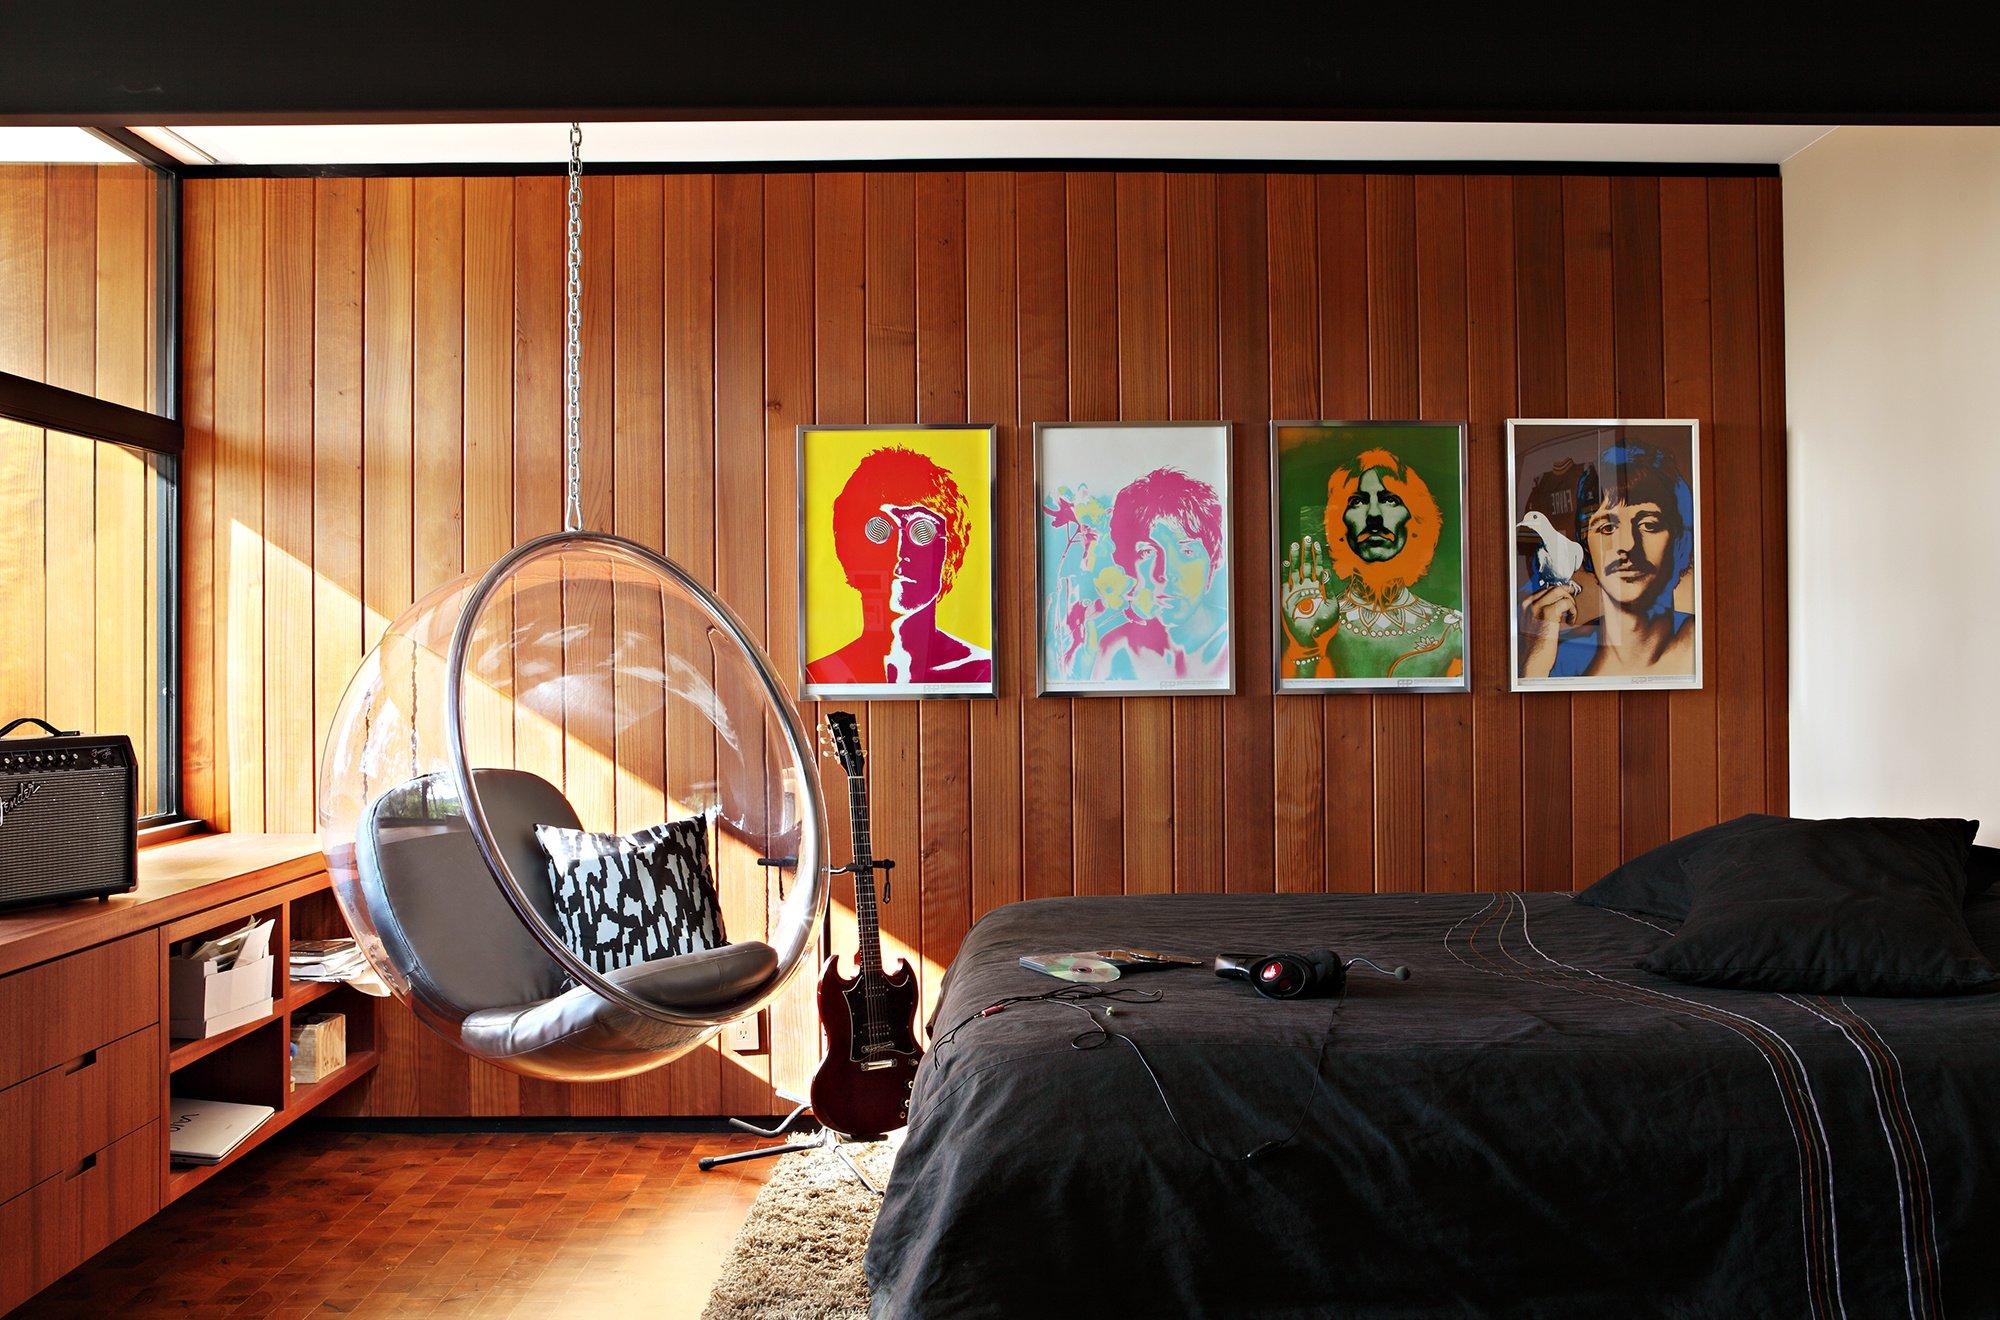 chair for teenage bedroom metal frame chairs bed interior design room beatles wallpaper